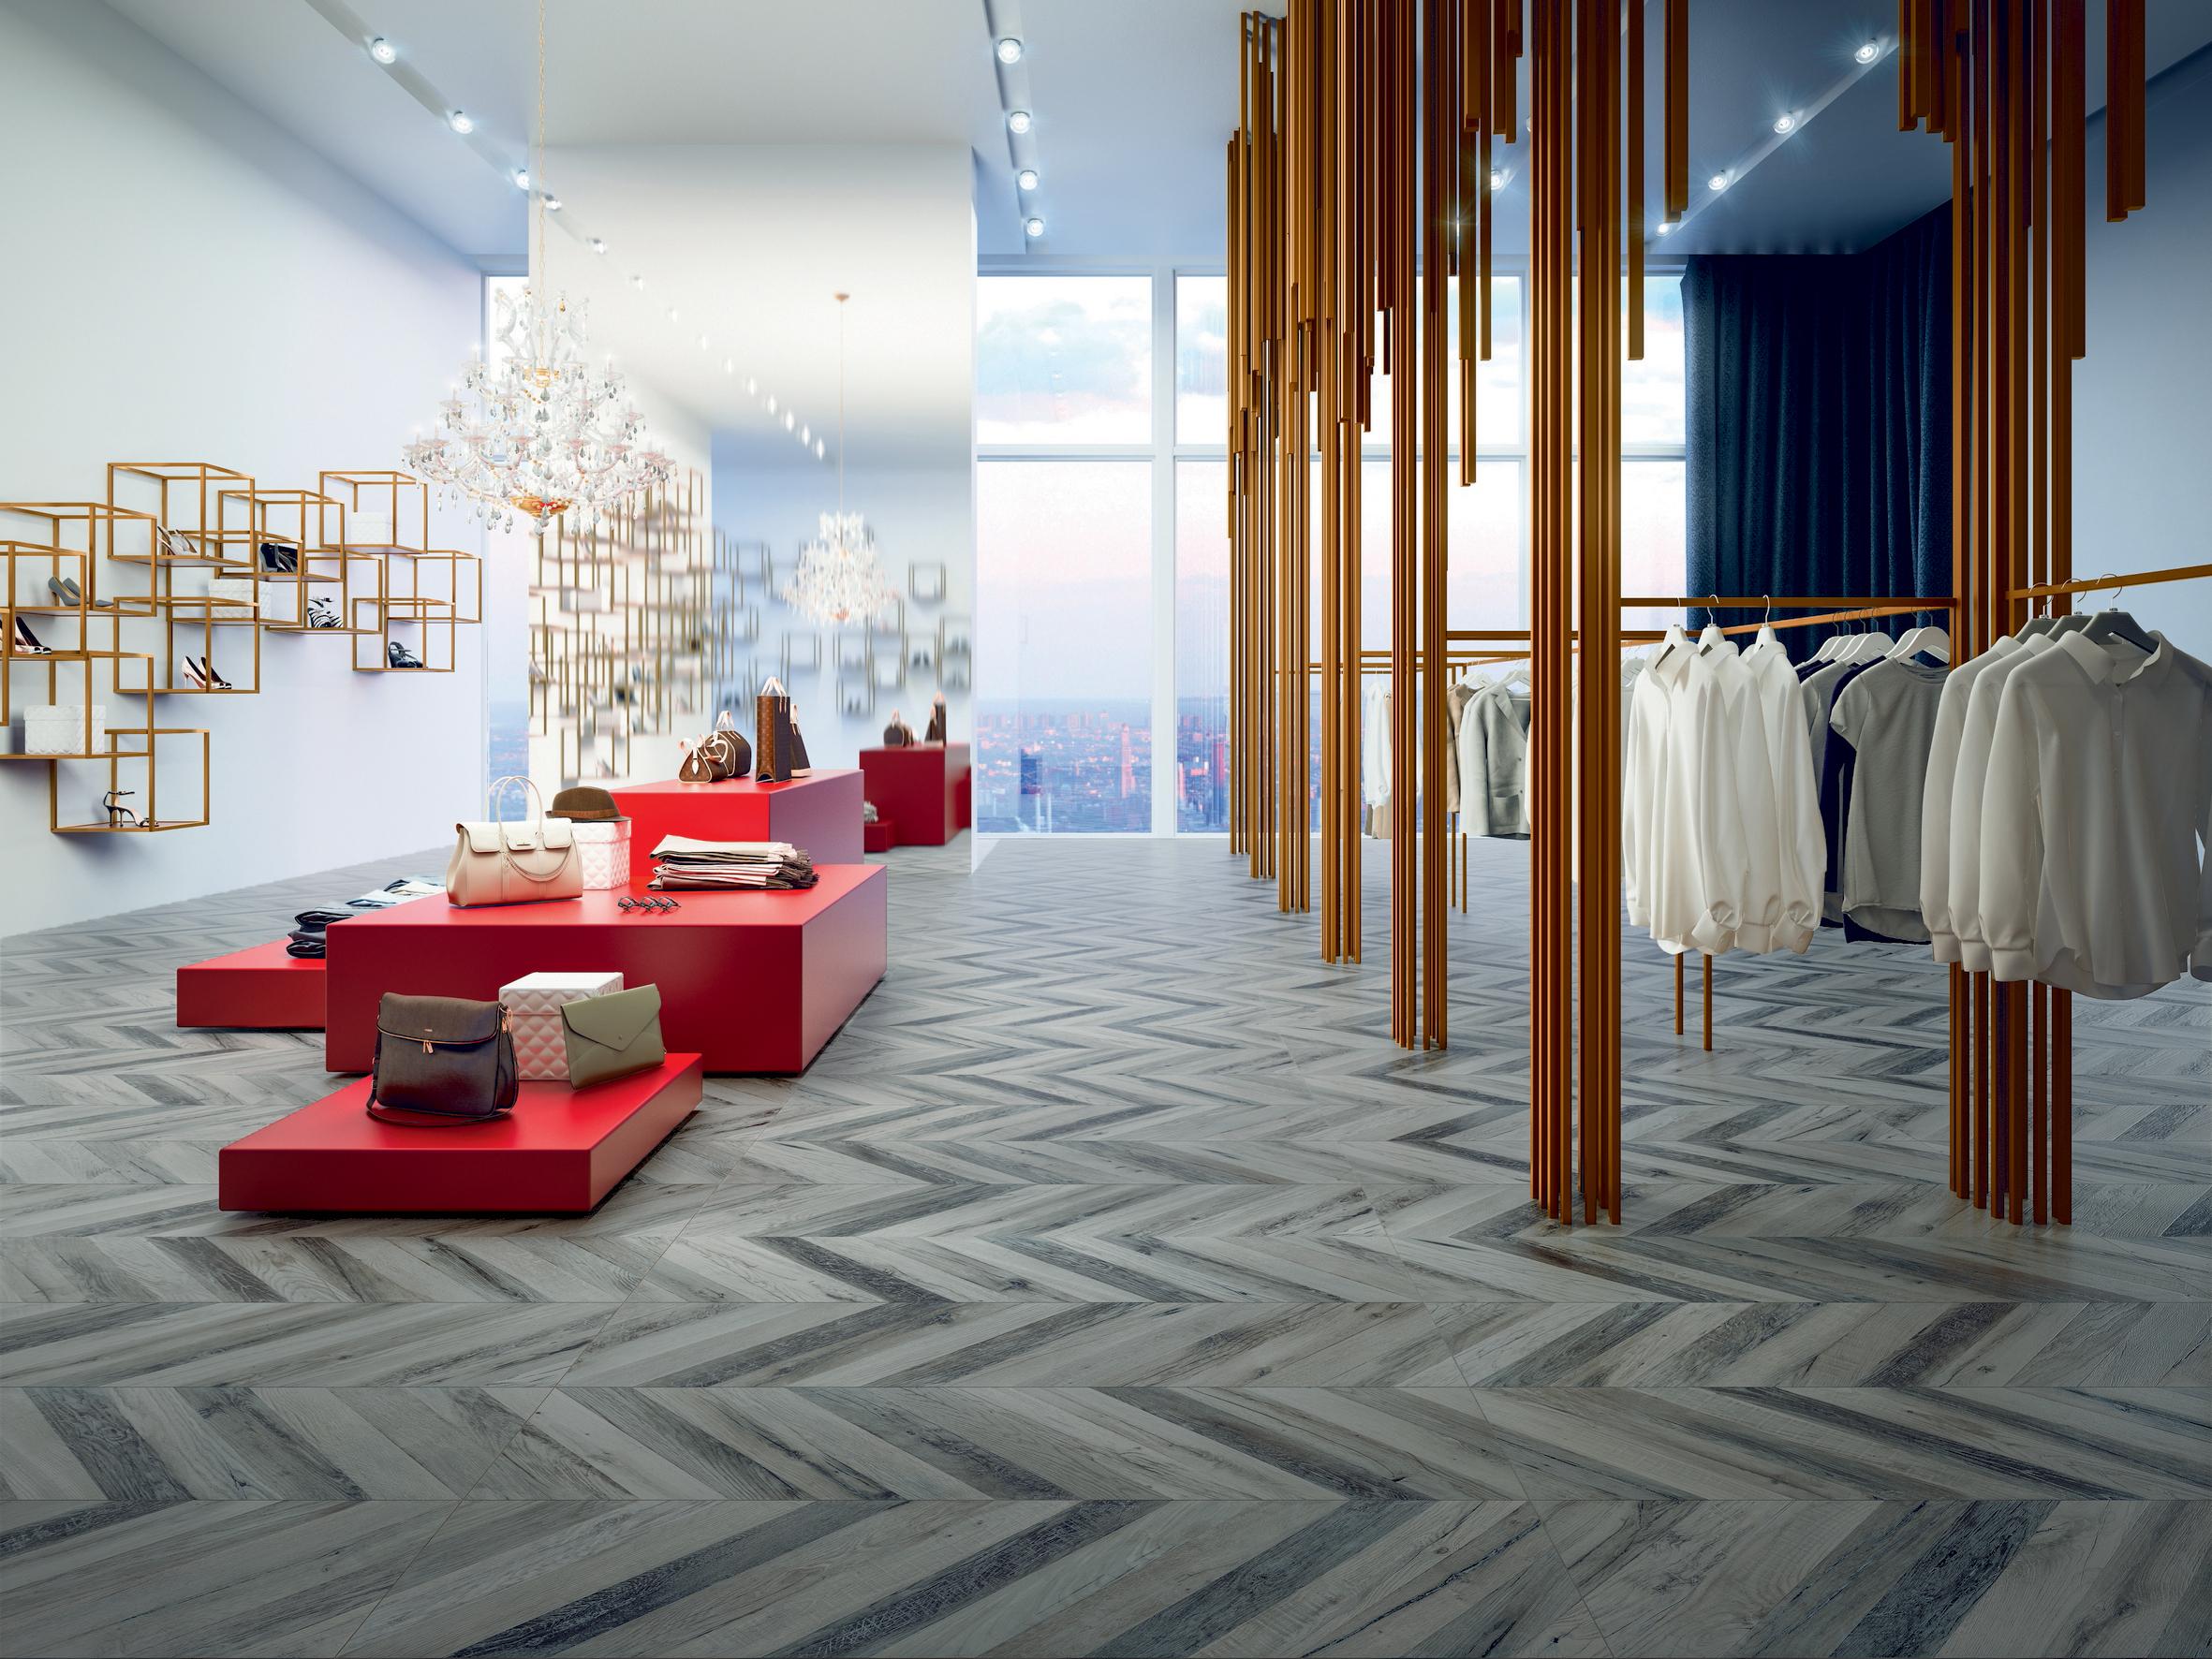 porcelain tile images: Lignum range high quality photo